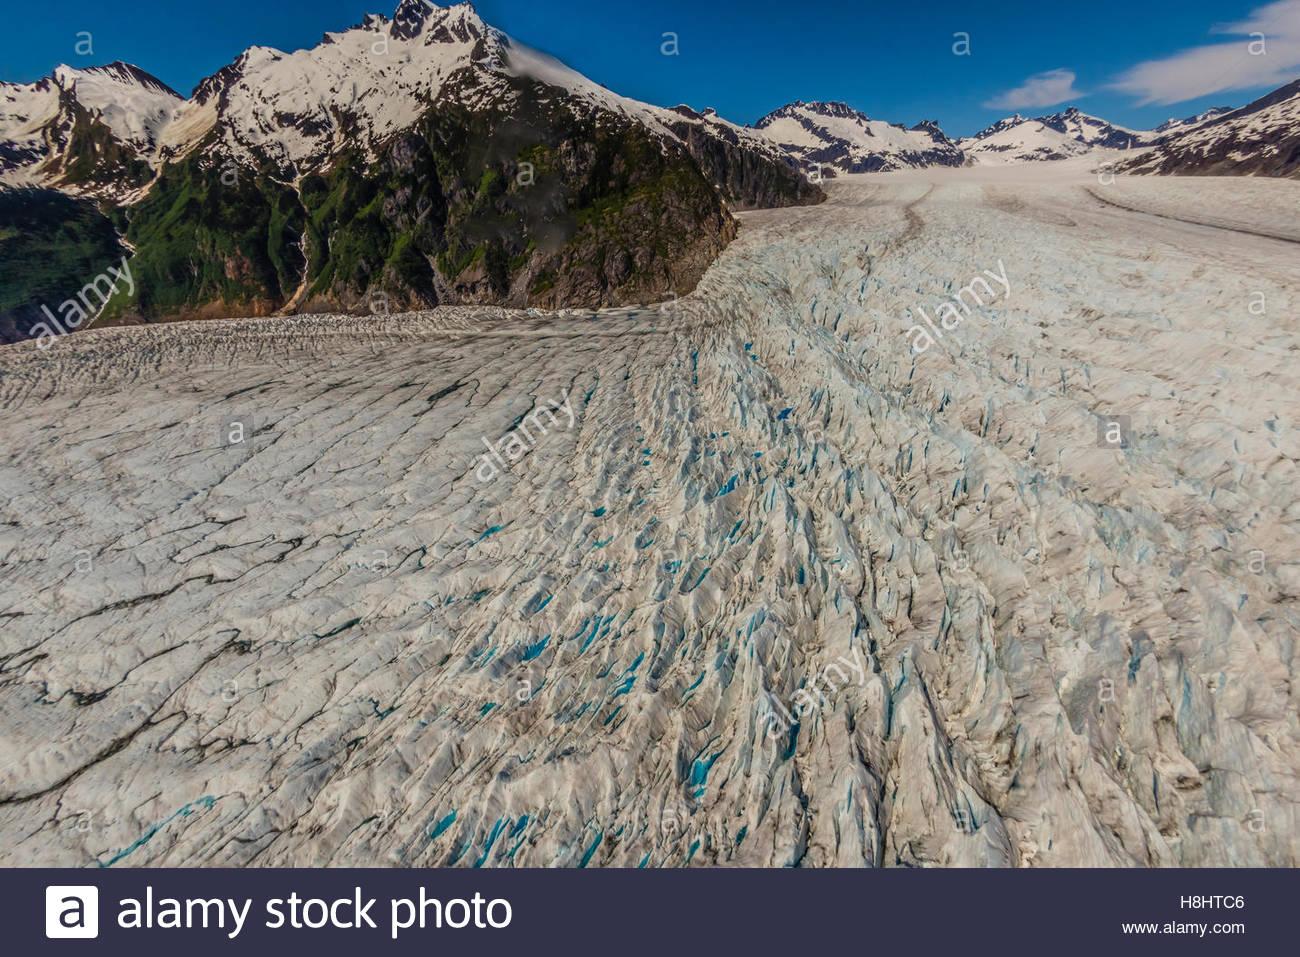 Aerial view of the Mendenhall Glacier, Juneau, Alaska USA. - Stock Image